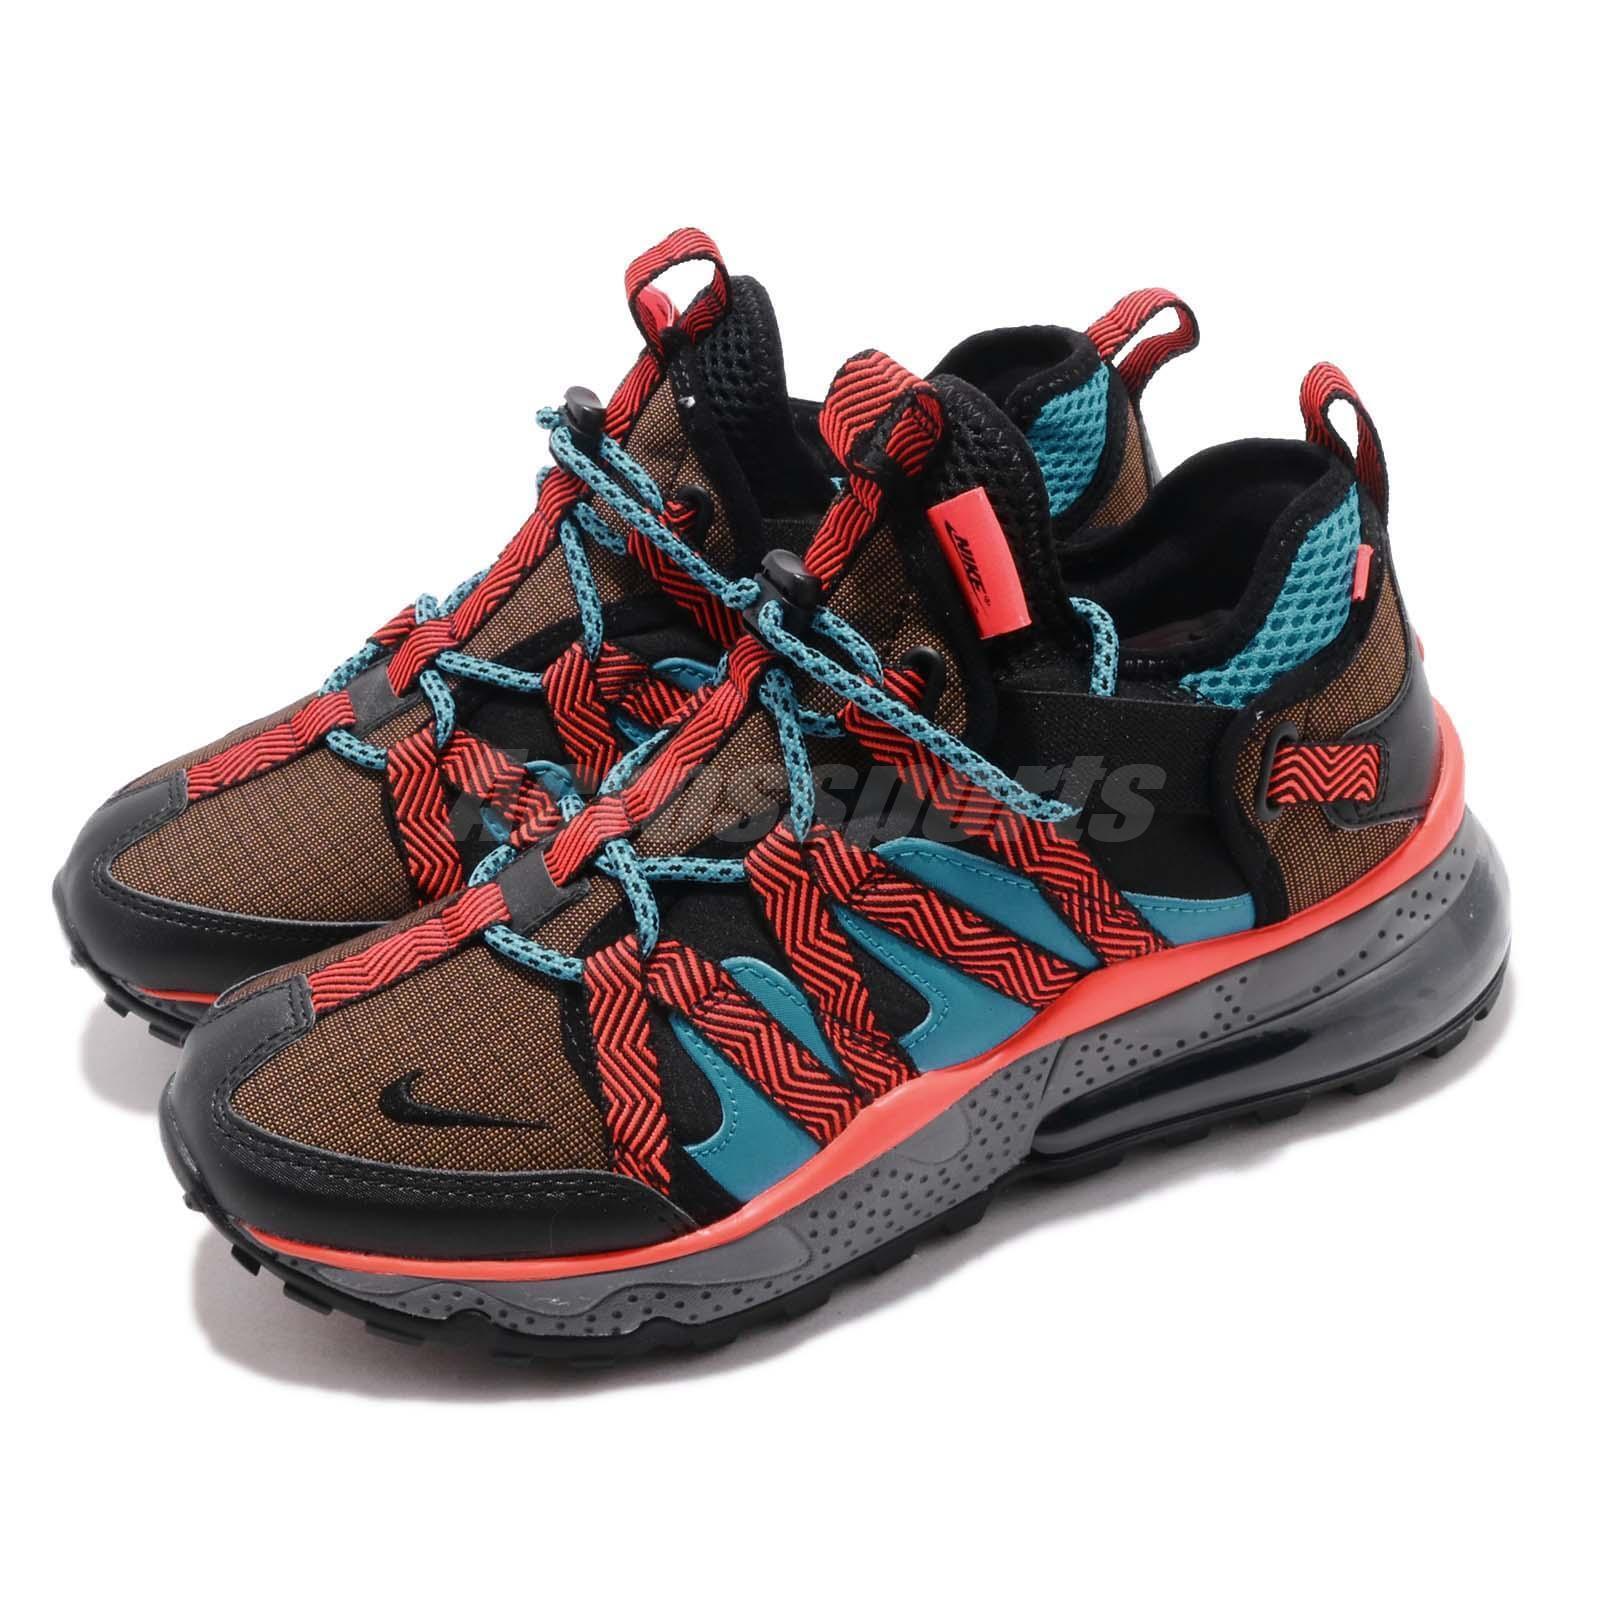 Nike Air Max 270 BOWFIN Dark Russet Black orange bluee Mens shoes AJ7200-200